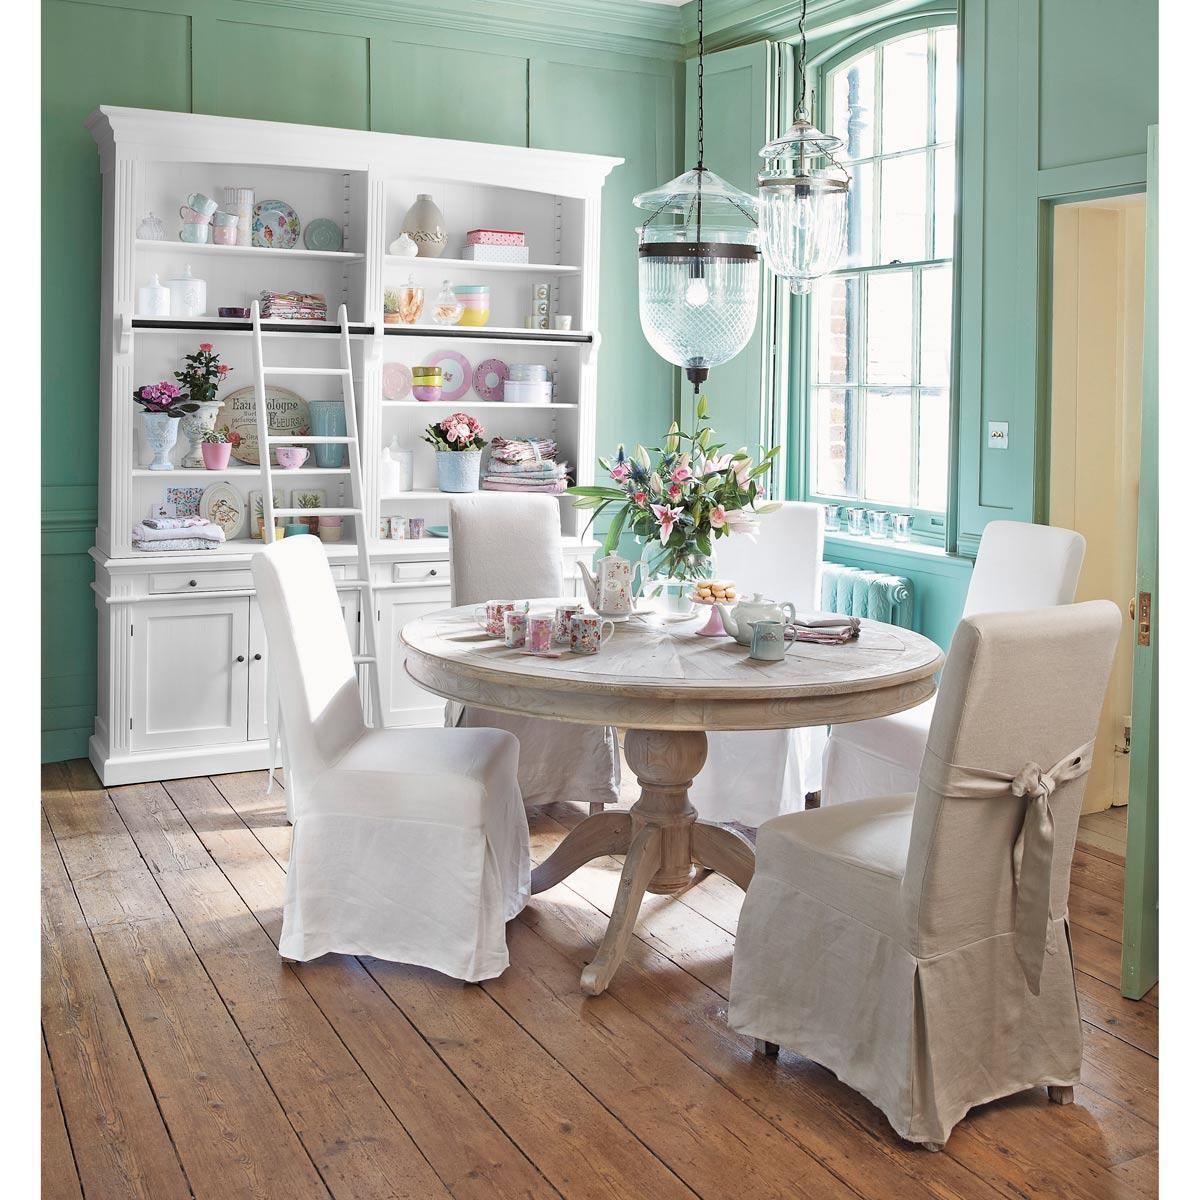 Tavolo Da Pranzo Shabby Chic : Tavoli shabby chic tavoli in stile allungabili cool sala da pranzo